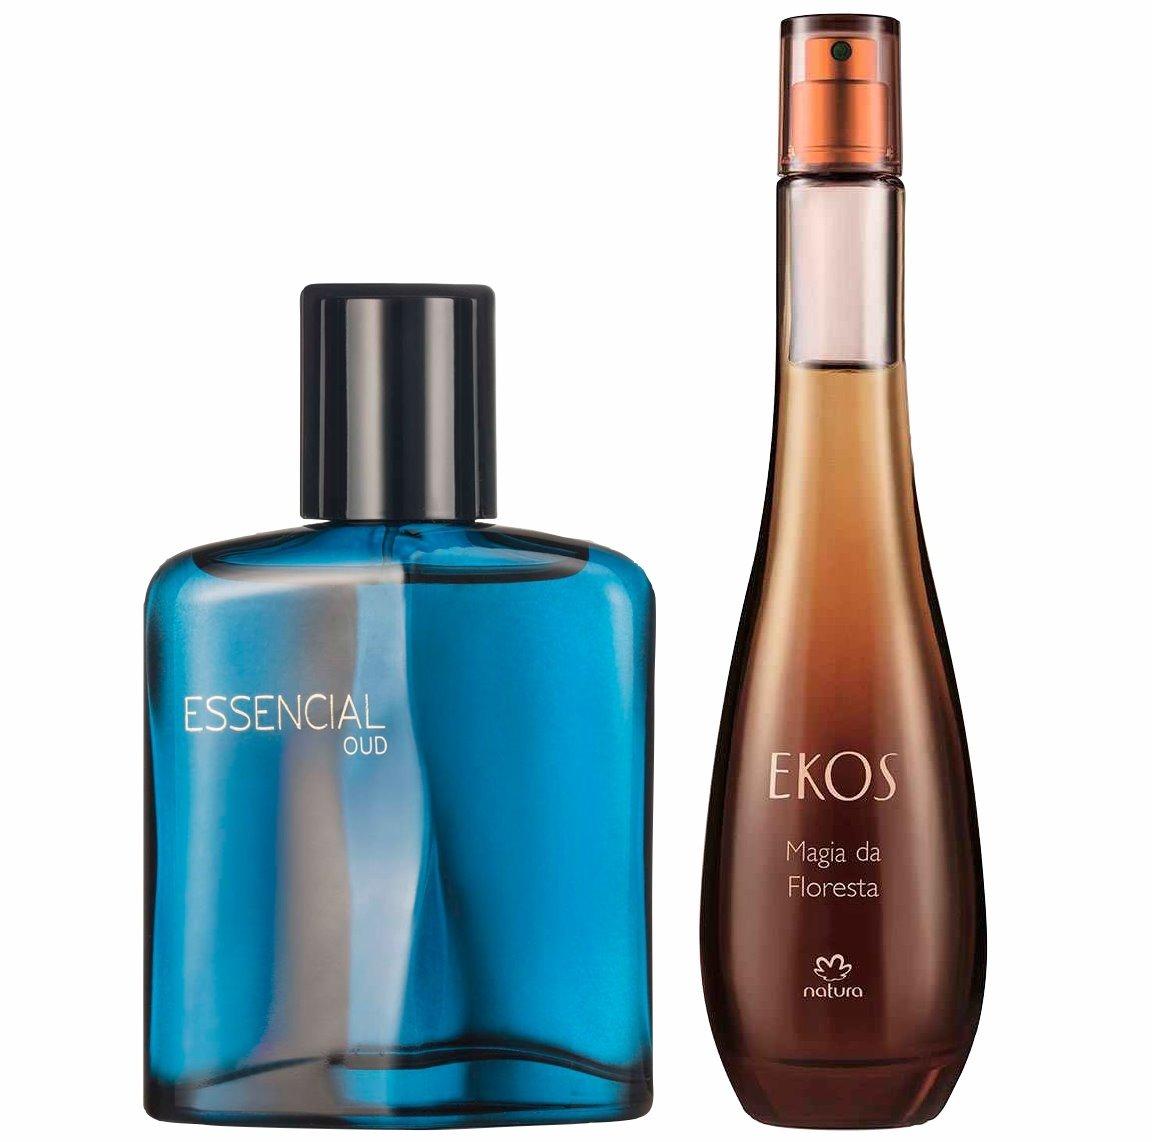 5f41c76d0 Perfume Natura Essencial Oud Masculino E Ekos Magia Floresta - R ...